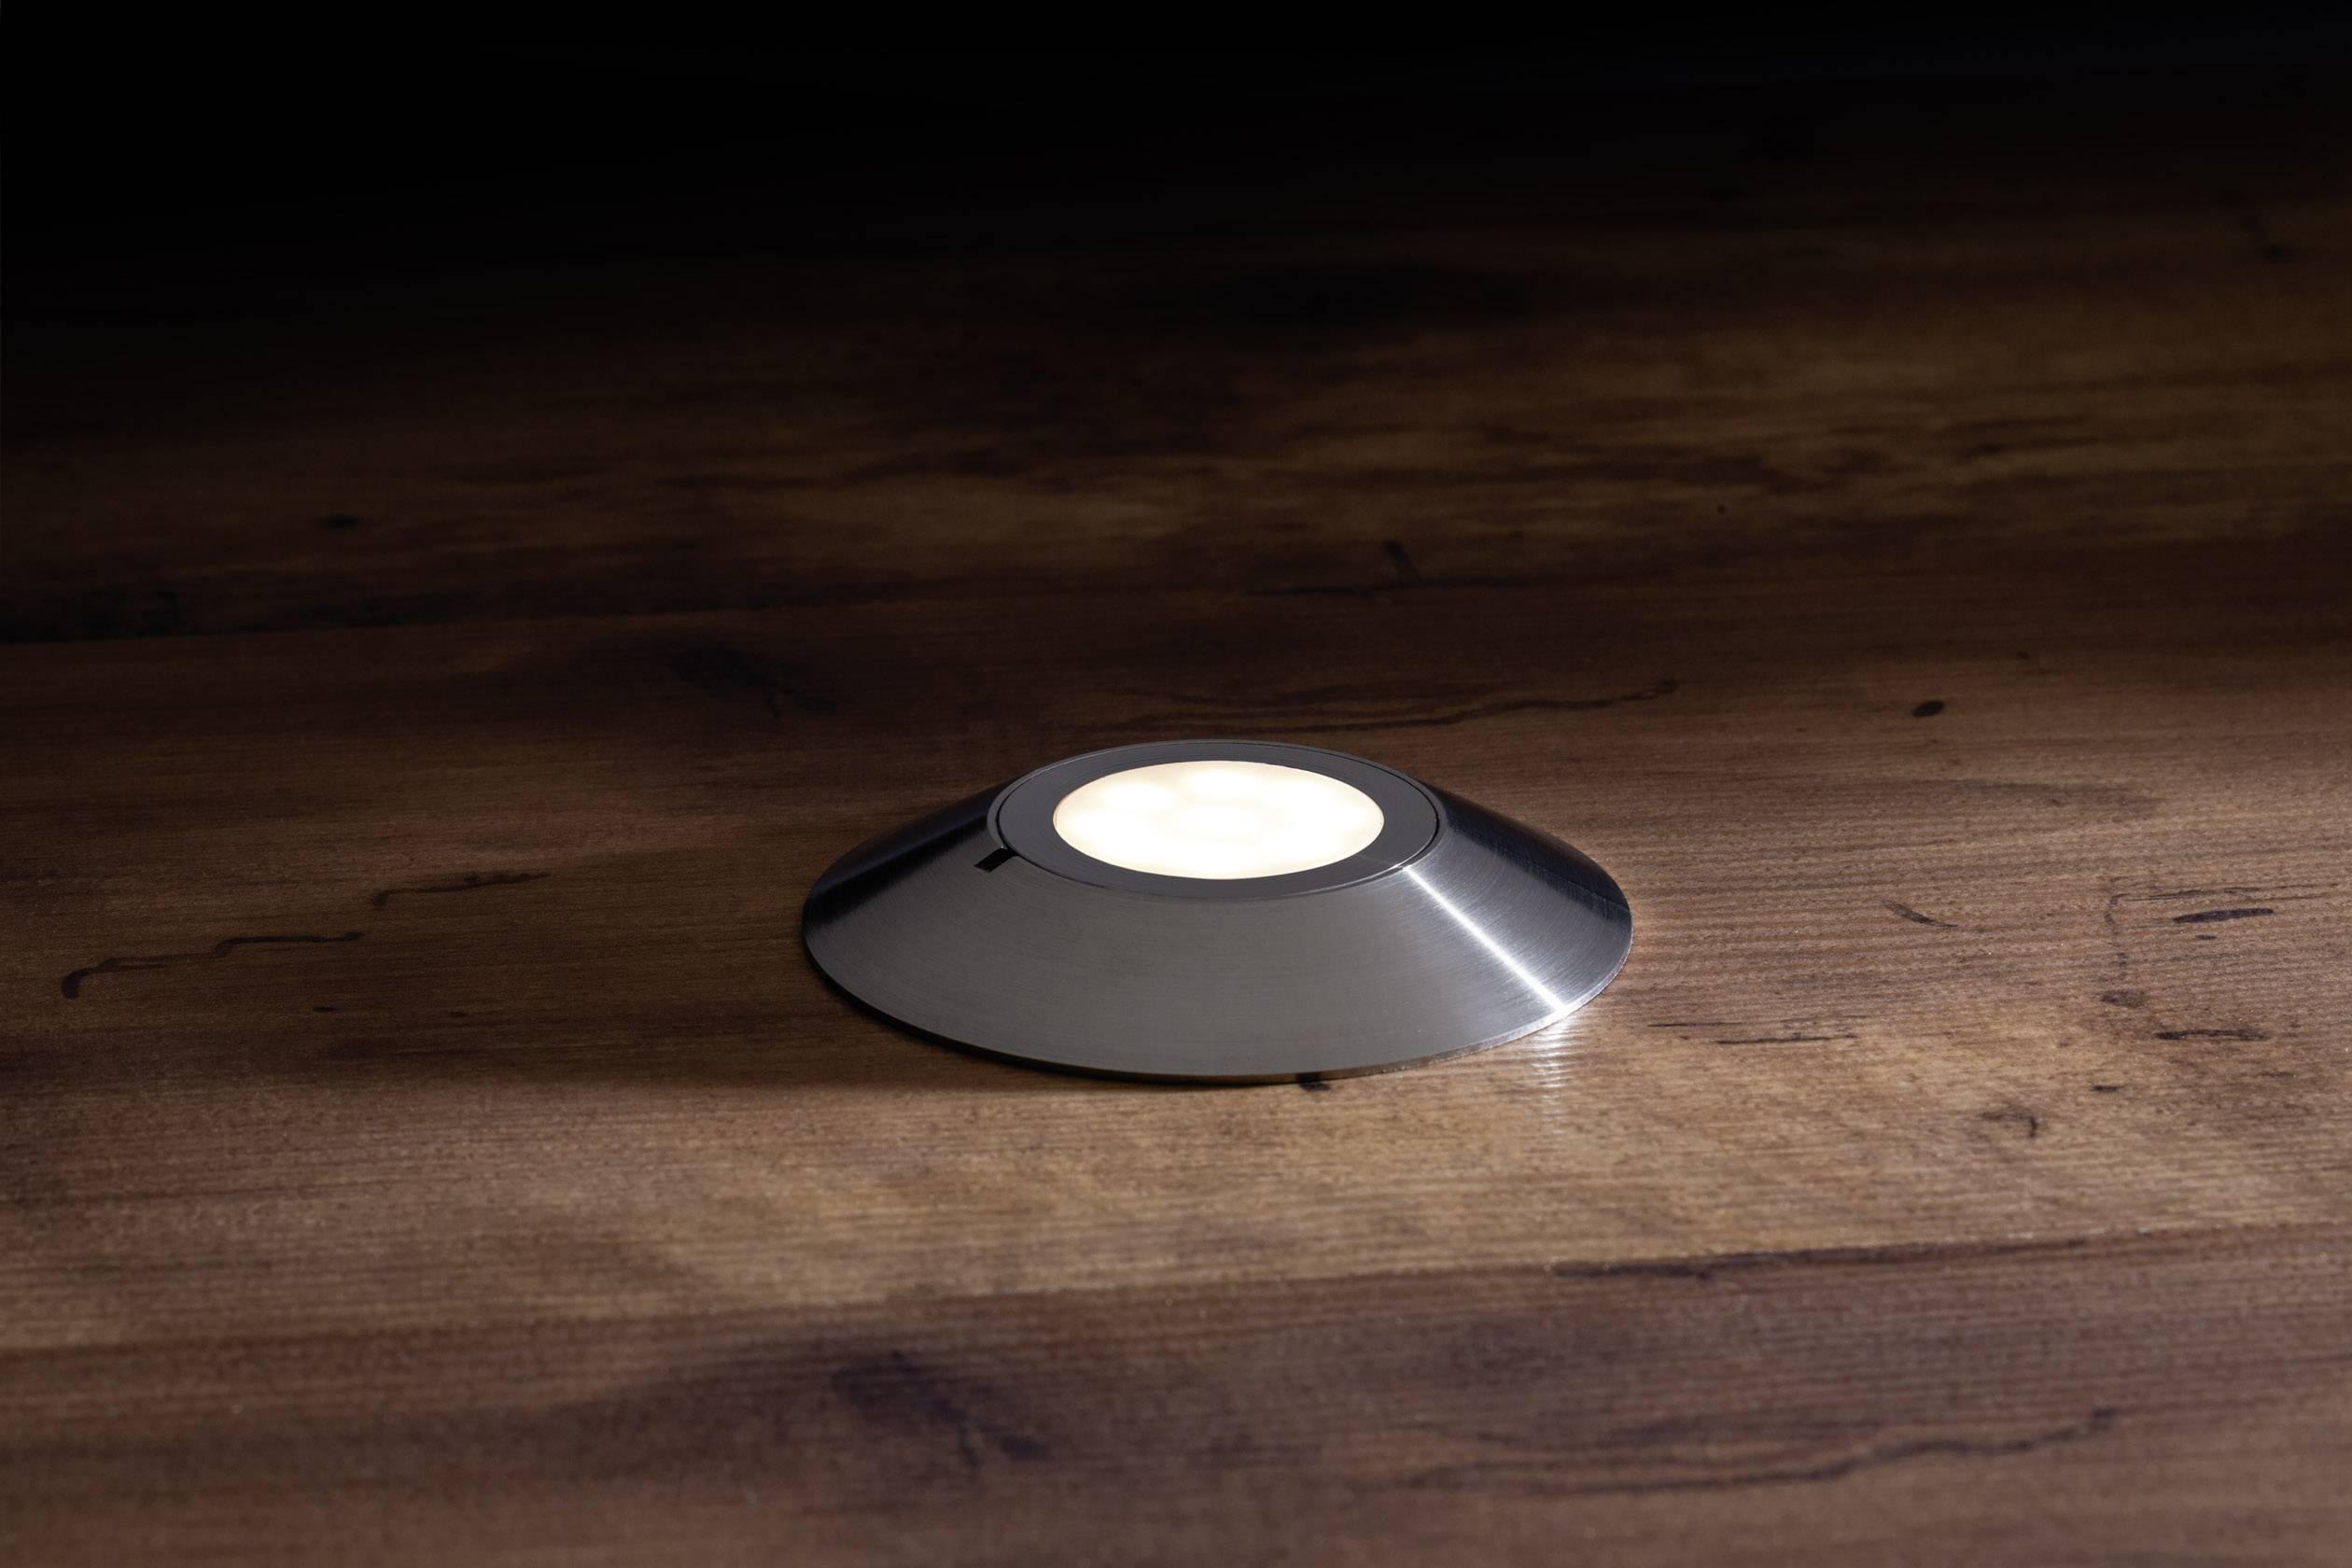 Paulmann Inbouwspots Badkamer : Led badkamer inbouwlamp w v warm wit paulmann allround